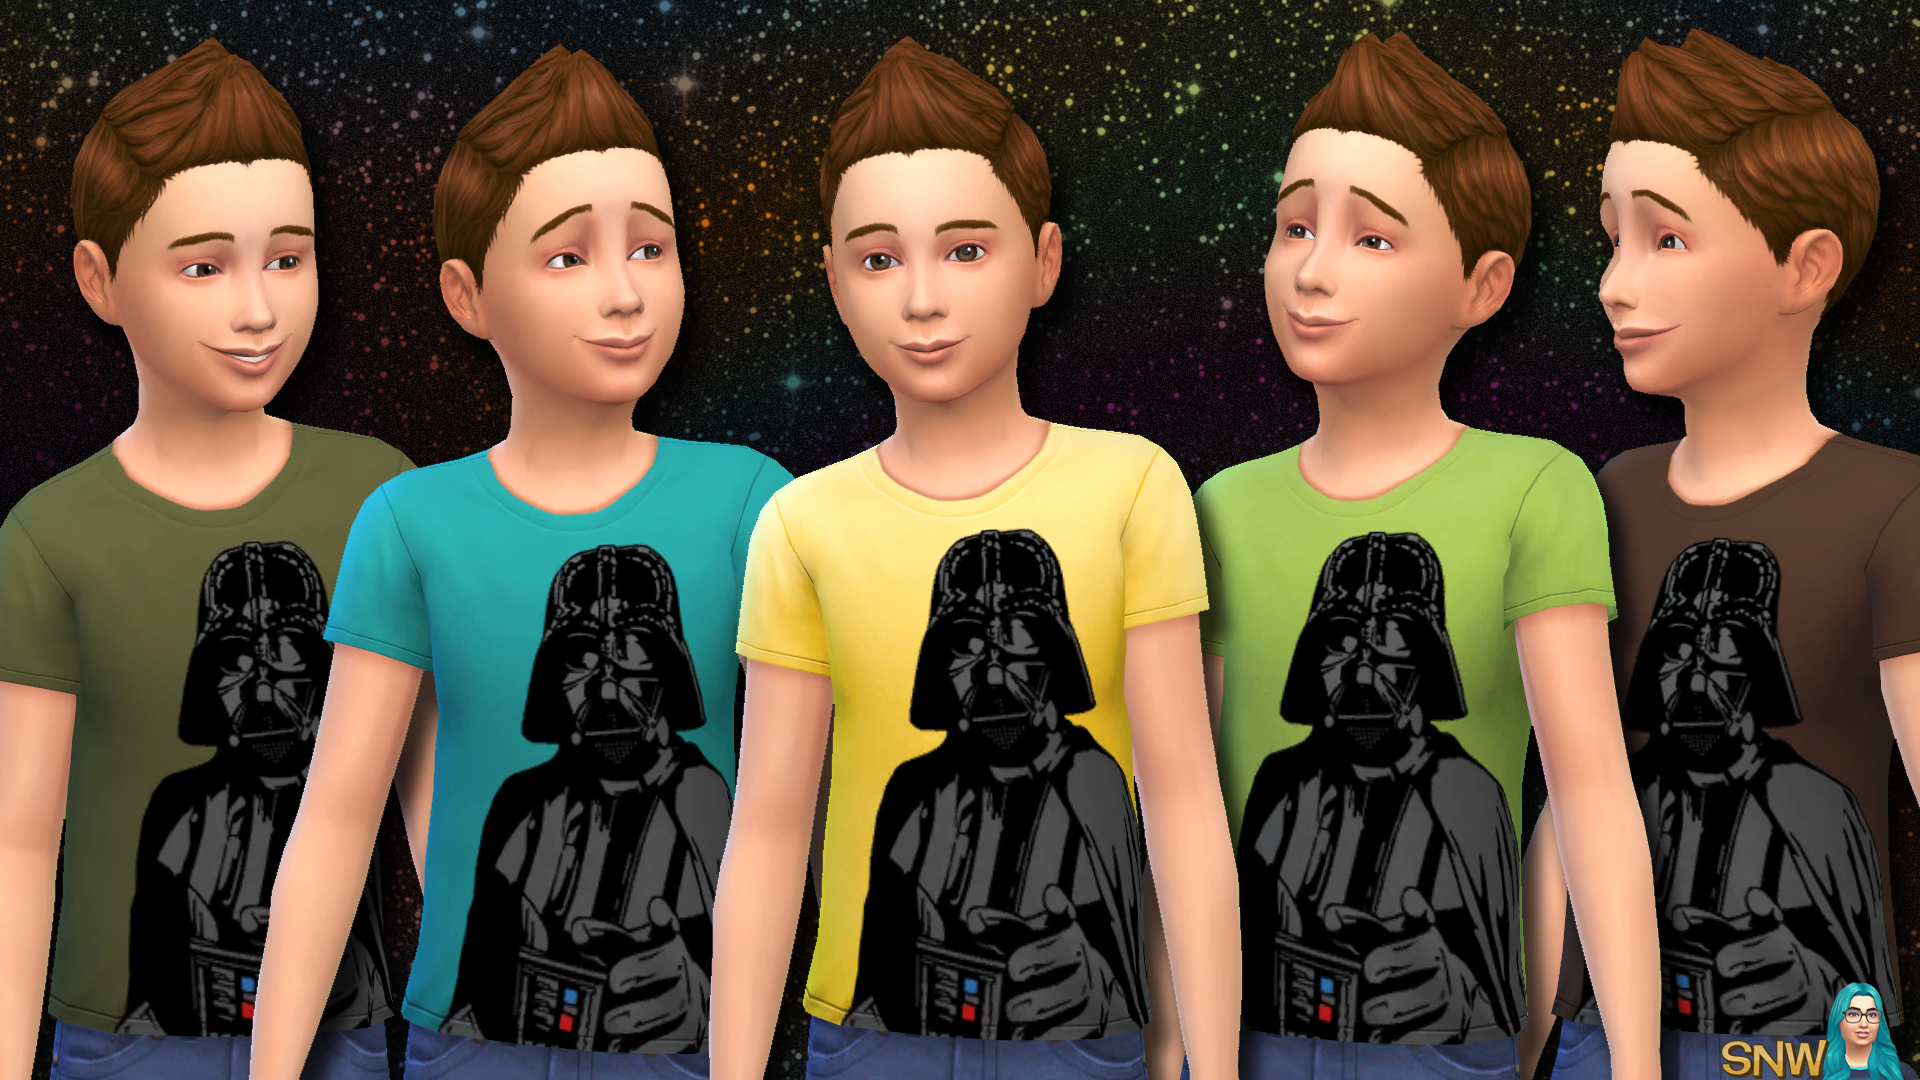 Star Wars Darth Vader Shirts for Kids